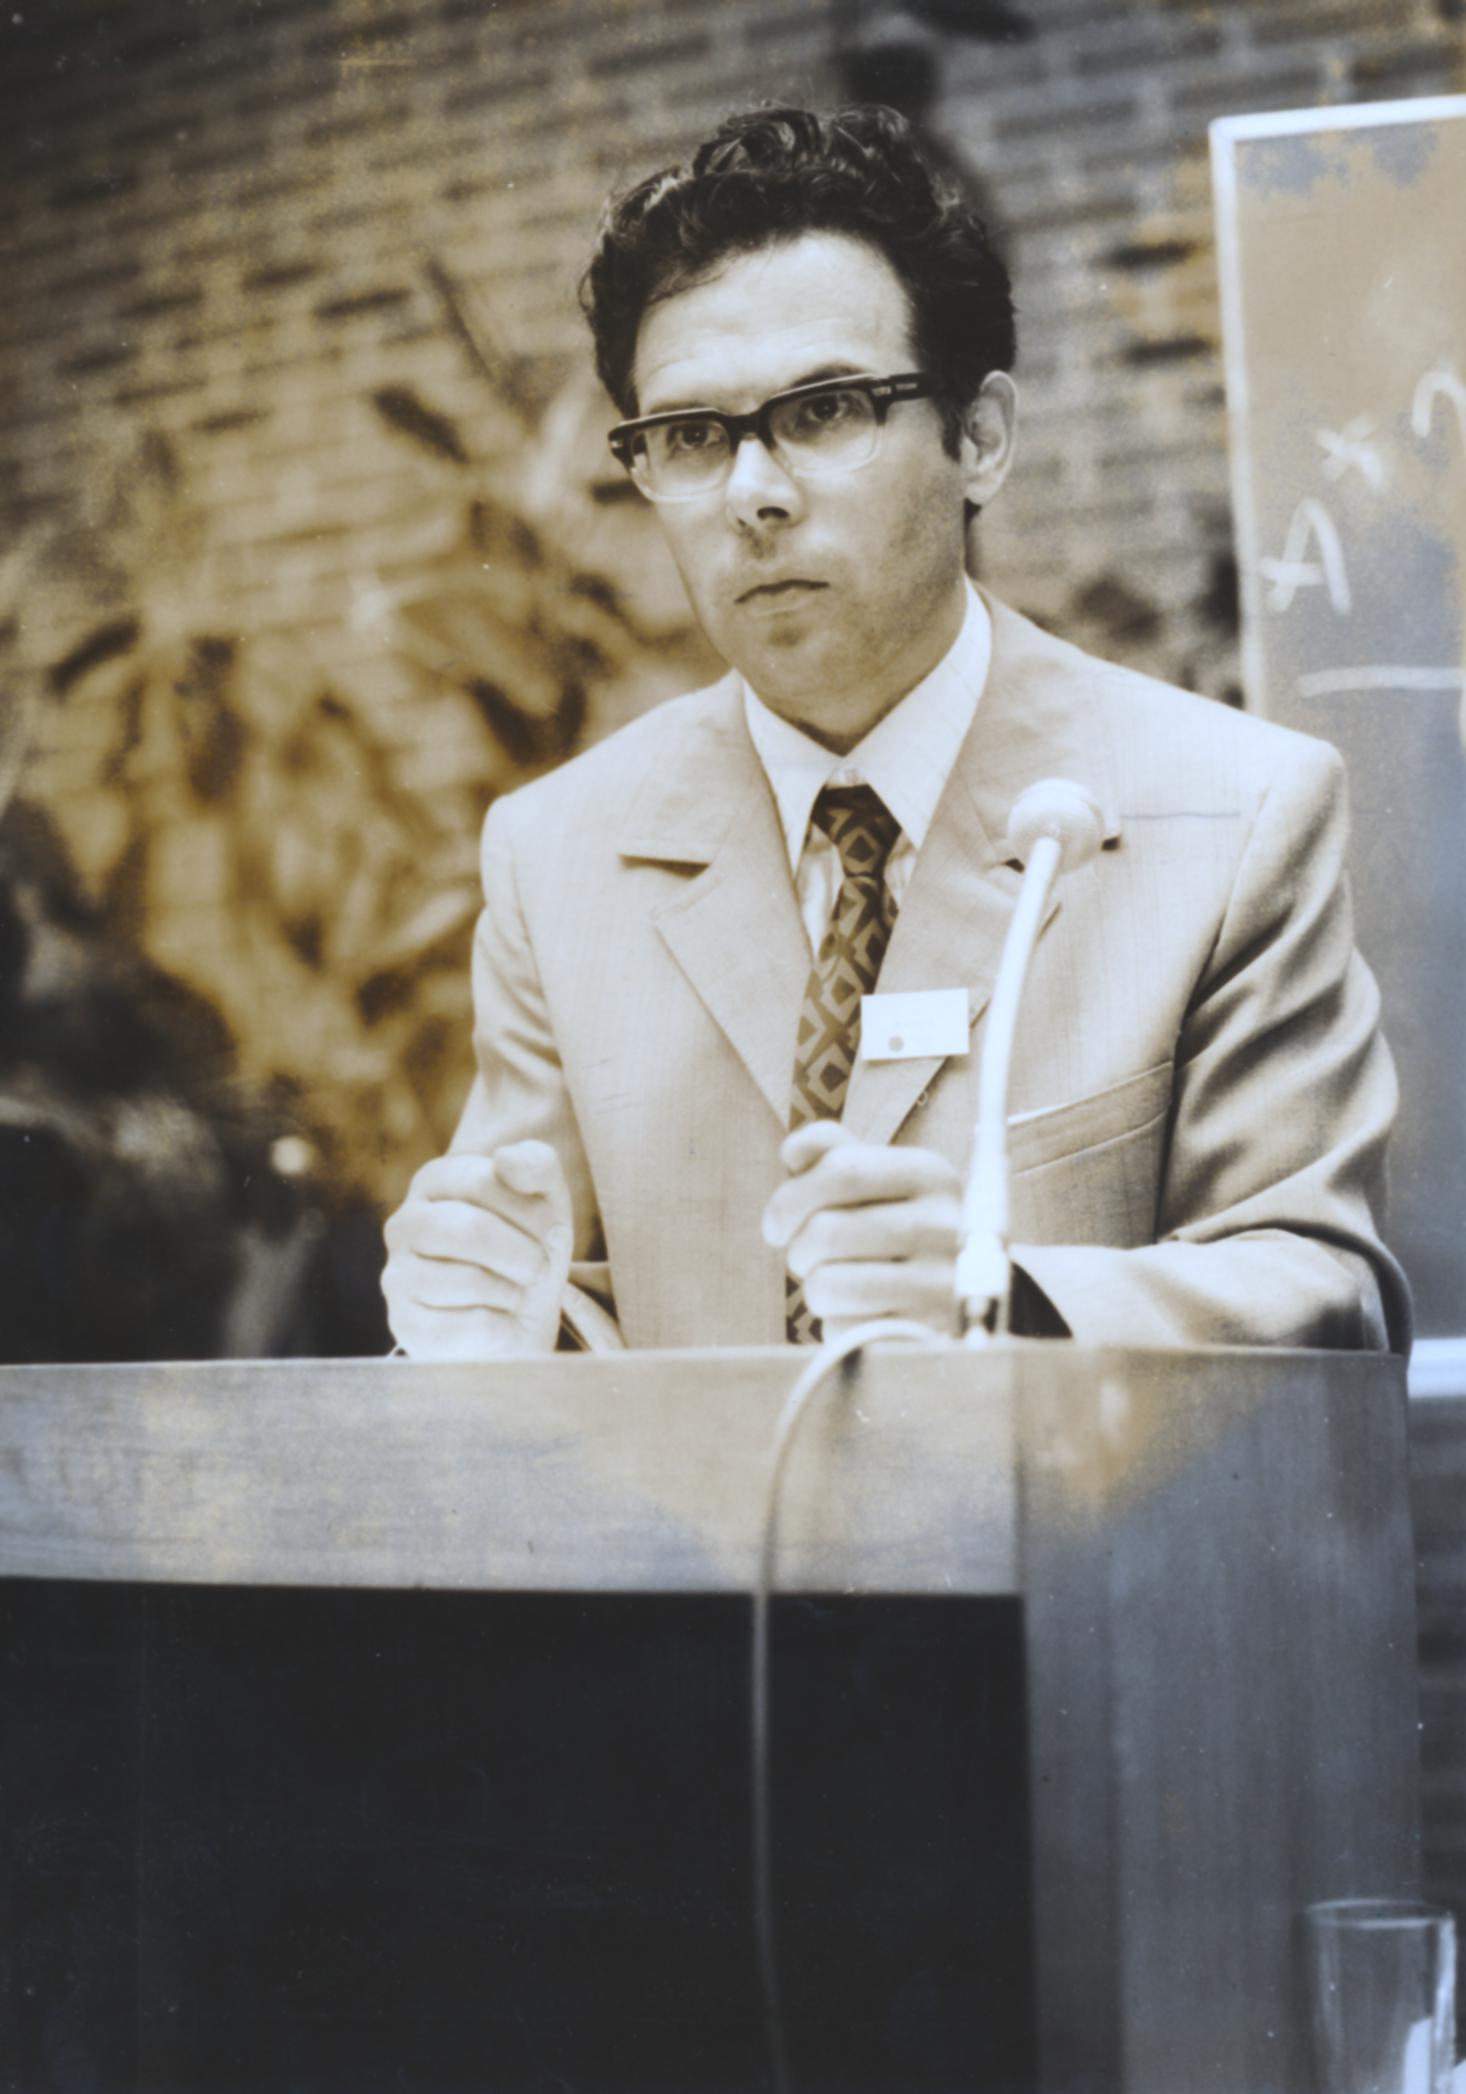 V. Internat. Imago Mundi-Kongress 1974, Cusanus Akademie, Brixen, Prof. Andreas Resch